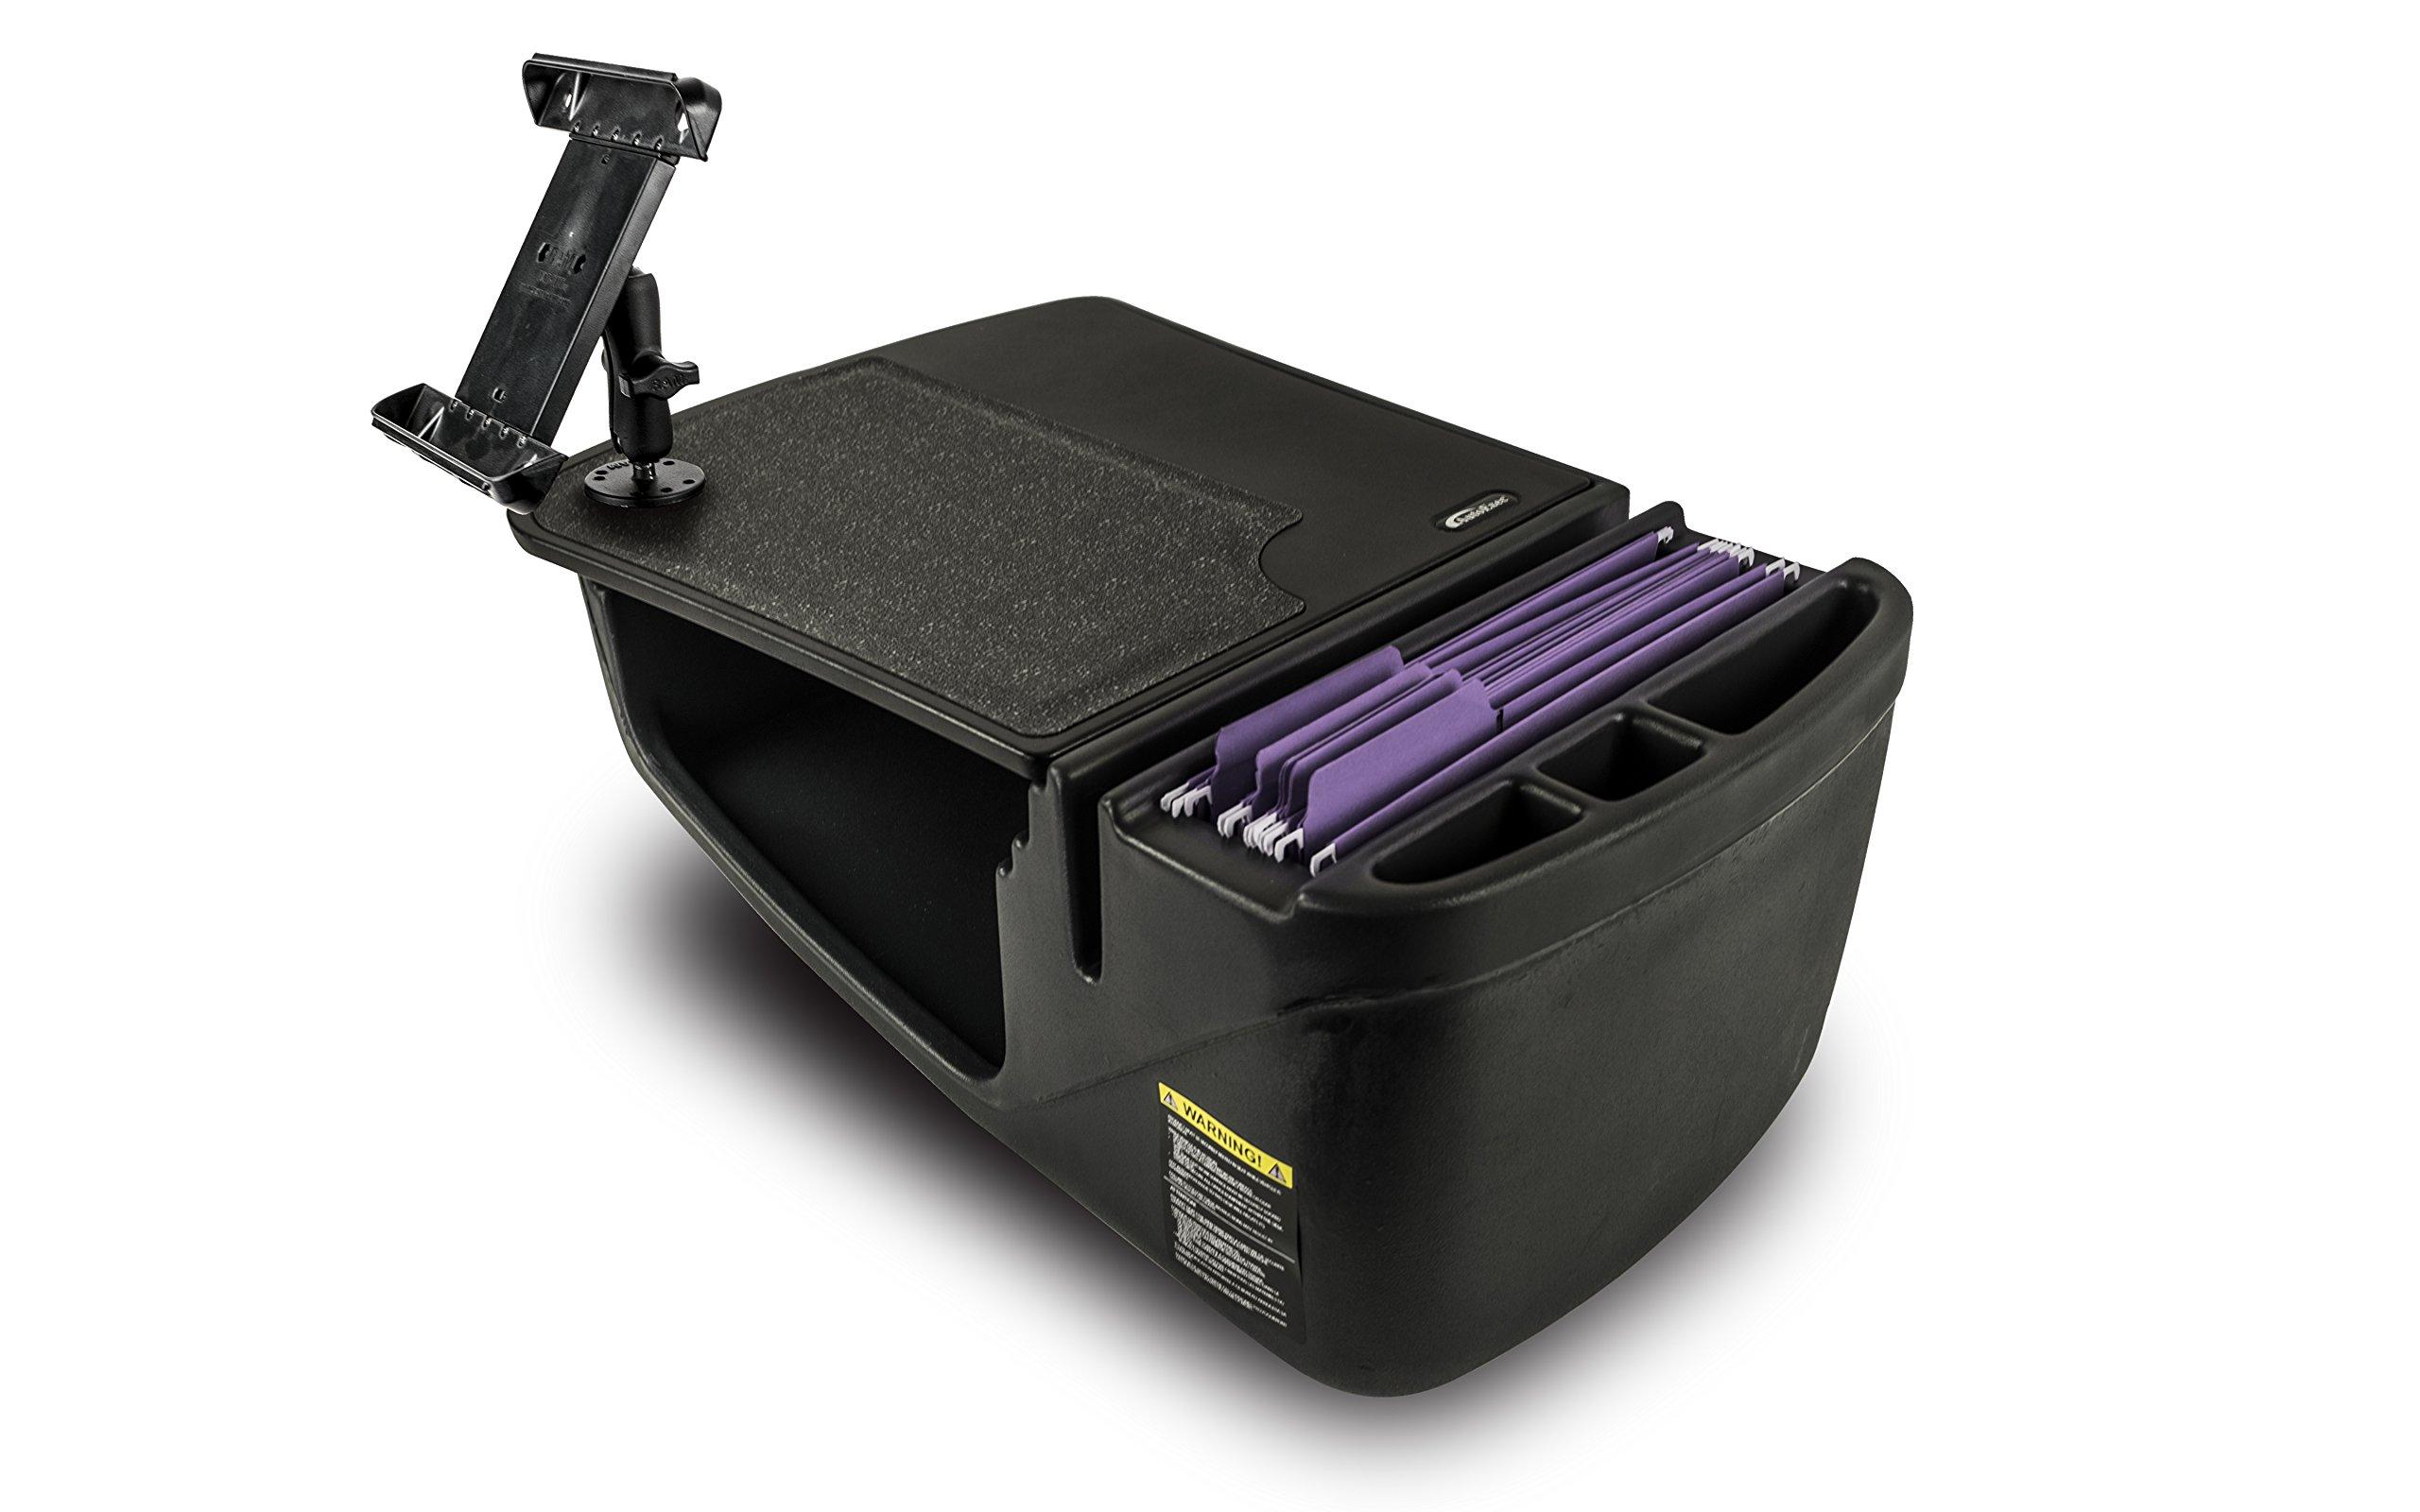 AutoExec AEGrip-02-Tablet-BLK Efficiency Car Desk (Black with iPad/Tablet Mount), 1 Pack